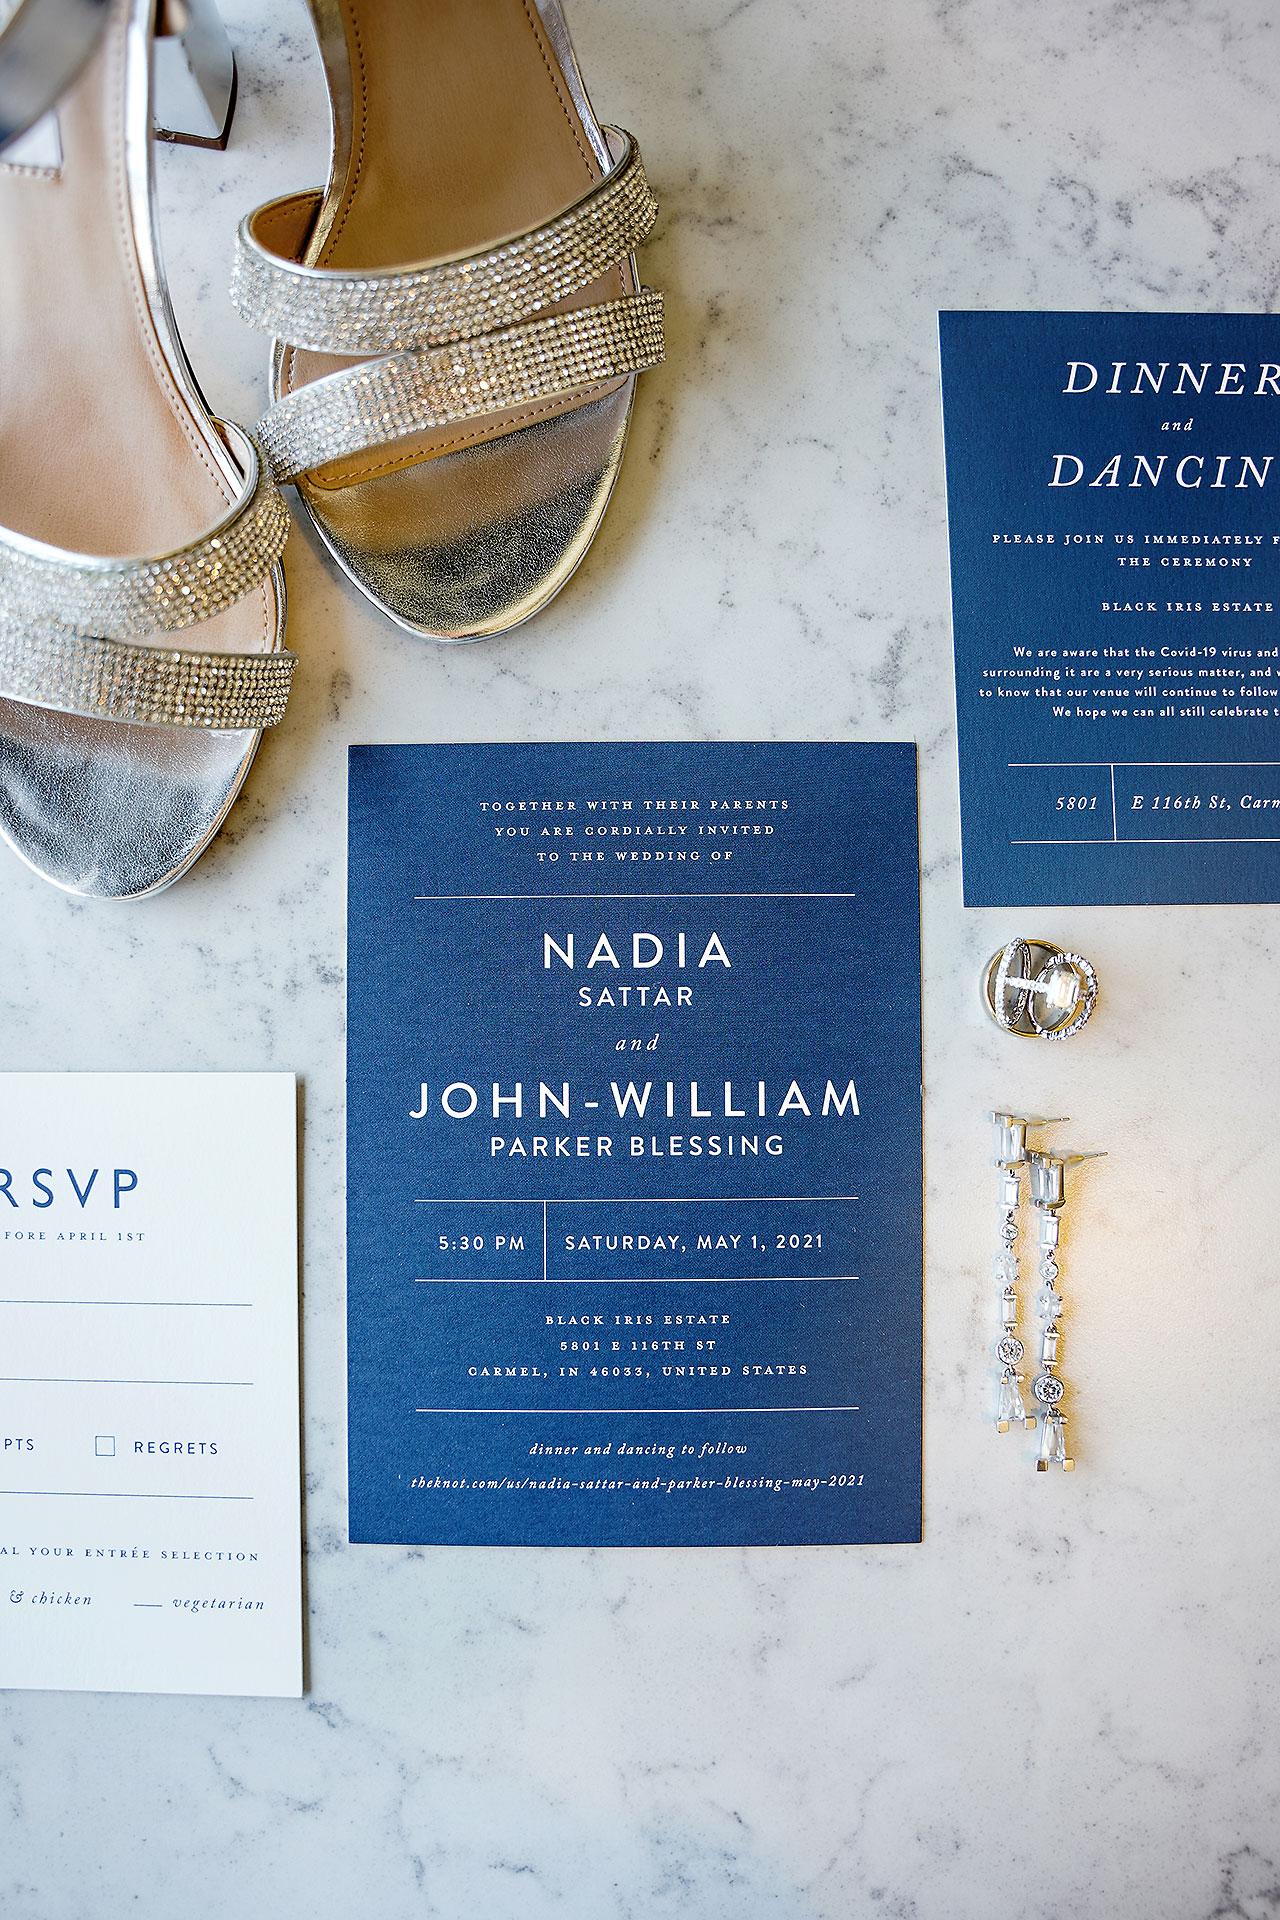 Nadia Parker Black Iris Estate Carmel Indiana Wedding May 2021 004